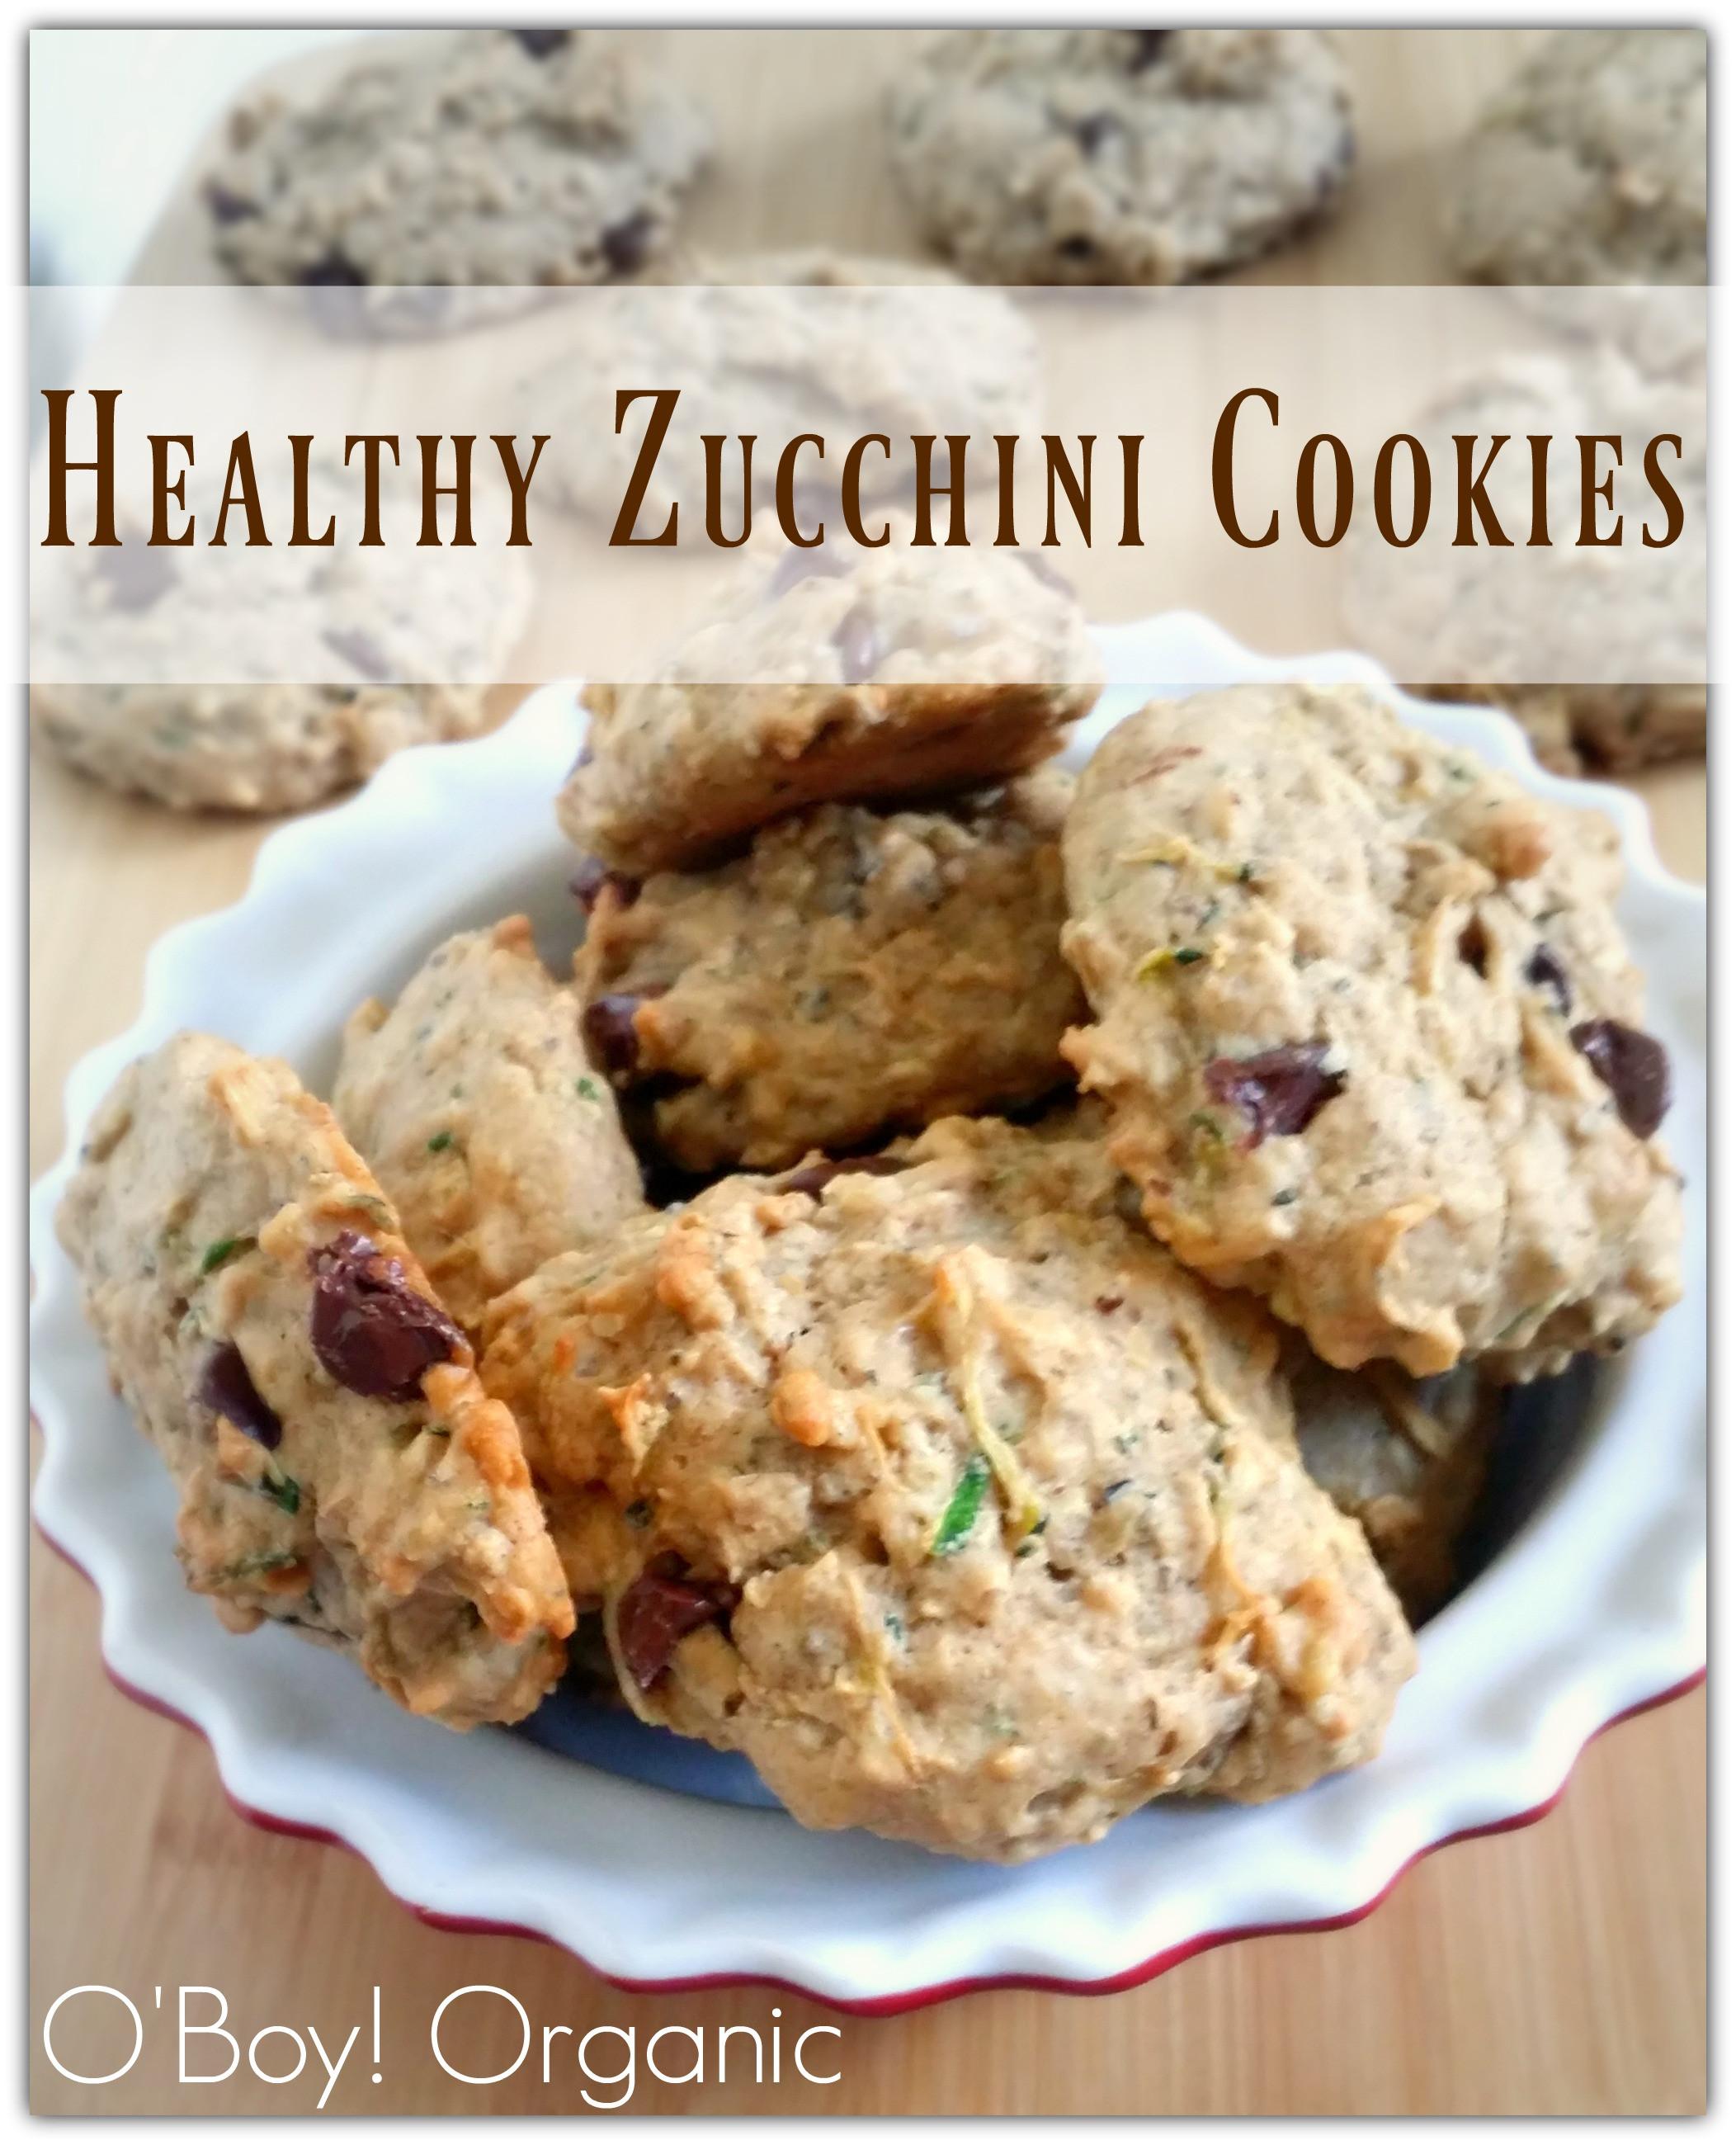 Healthy Zucchini Cookies  Healthy Zucchini Cookies